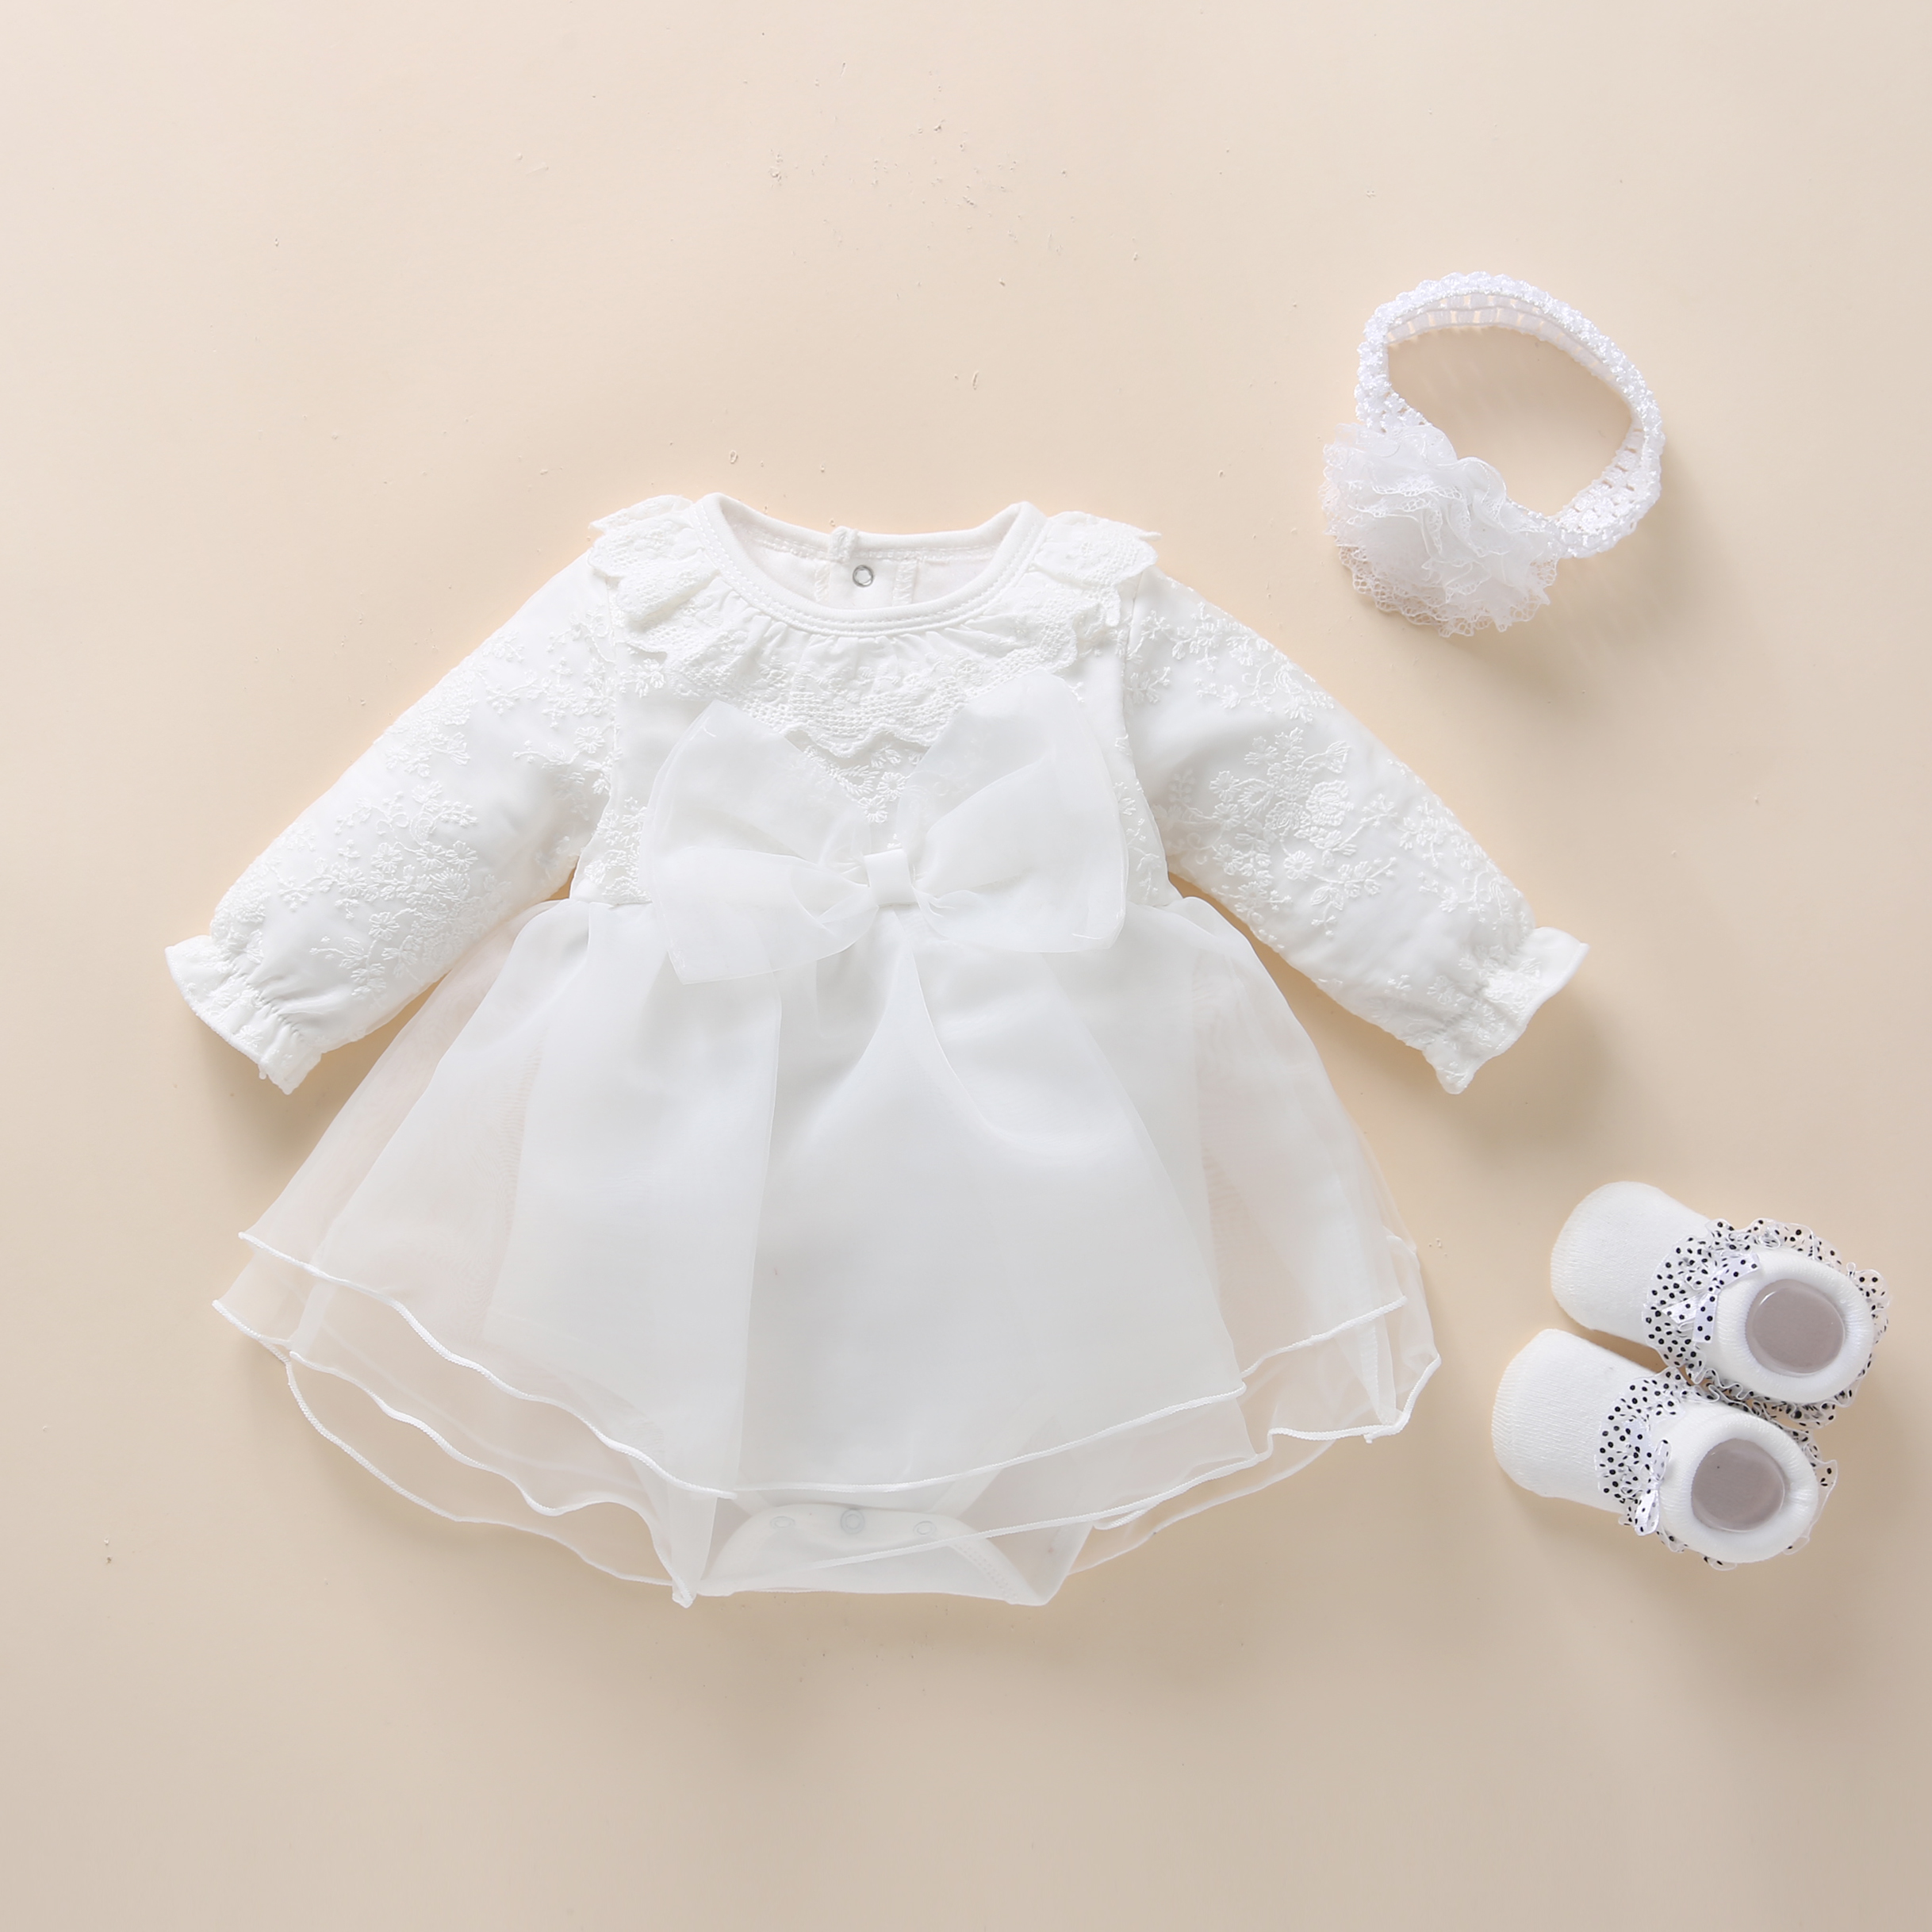 Baby Christening Dress White Newborn Snow White Baby Dress Baby Girl 1 Year Birthday Dress Long Sleeve Baby Baptism Dresses